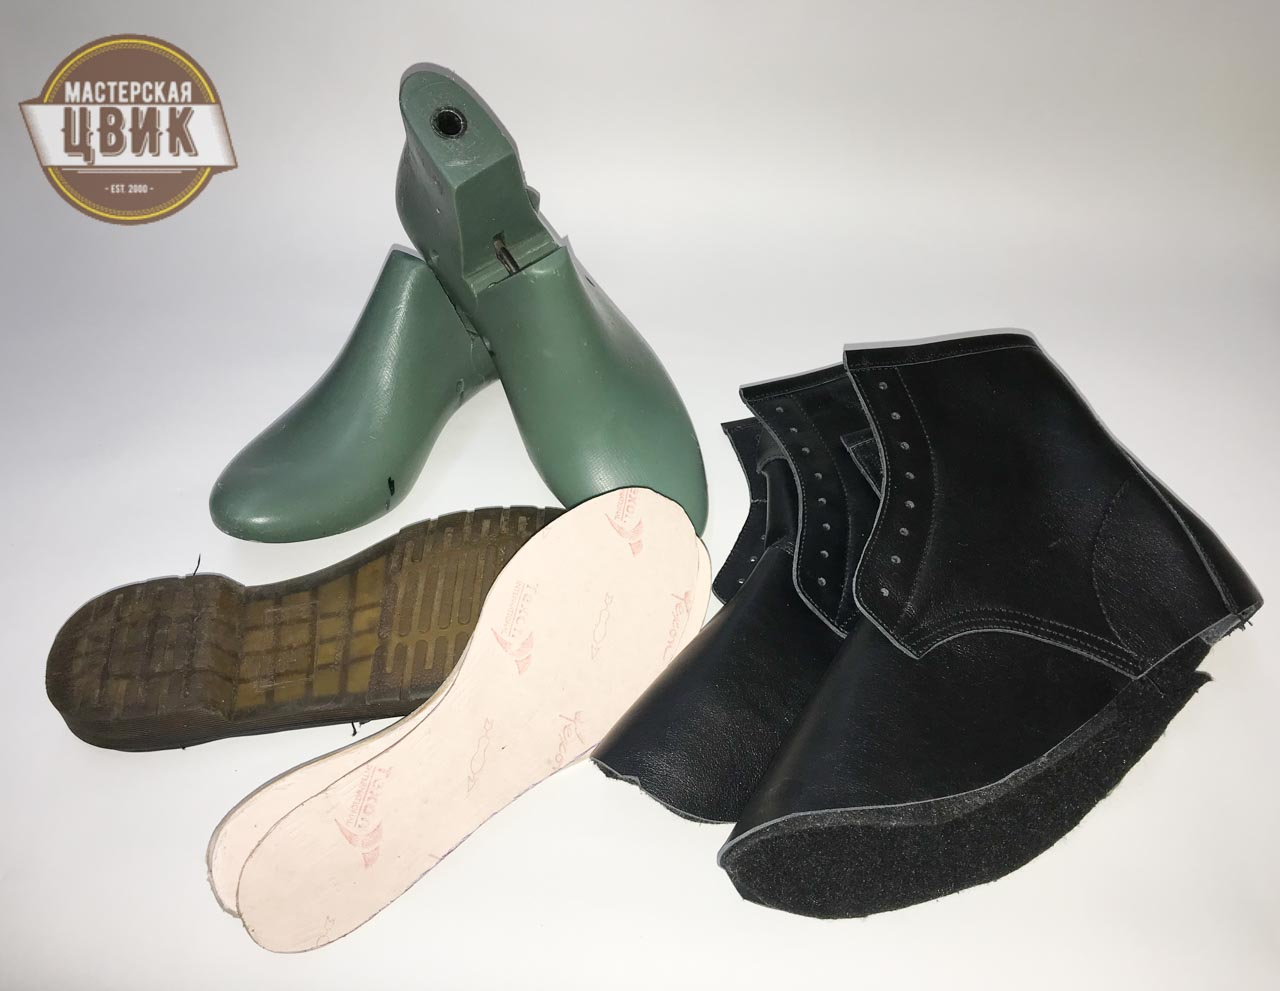 individualnyj-poshiv-obuvi-minsk-55 Индивидуальный пошив обуви Минск-55